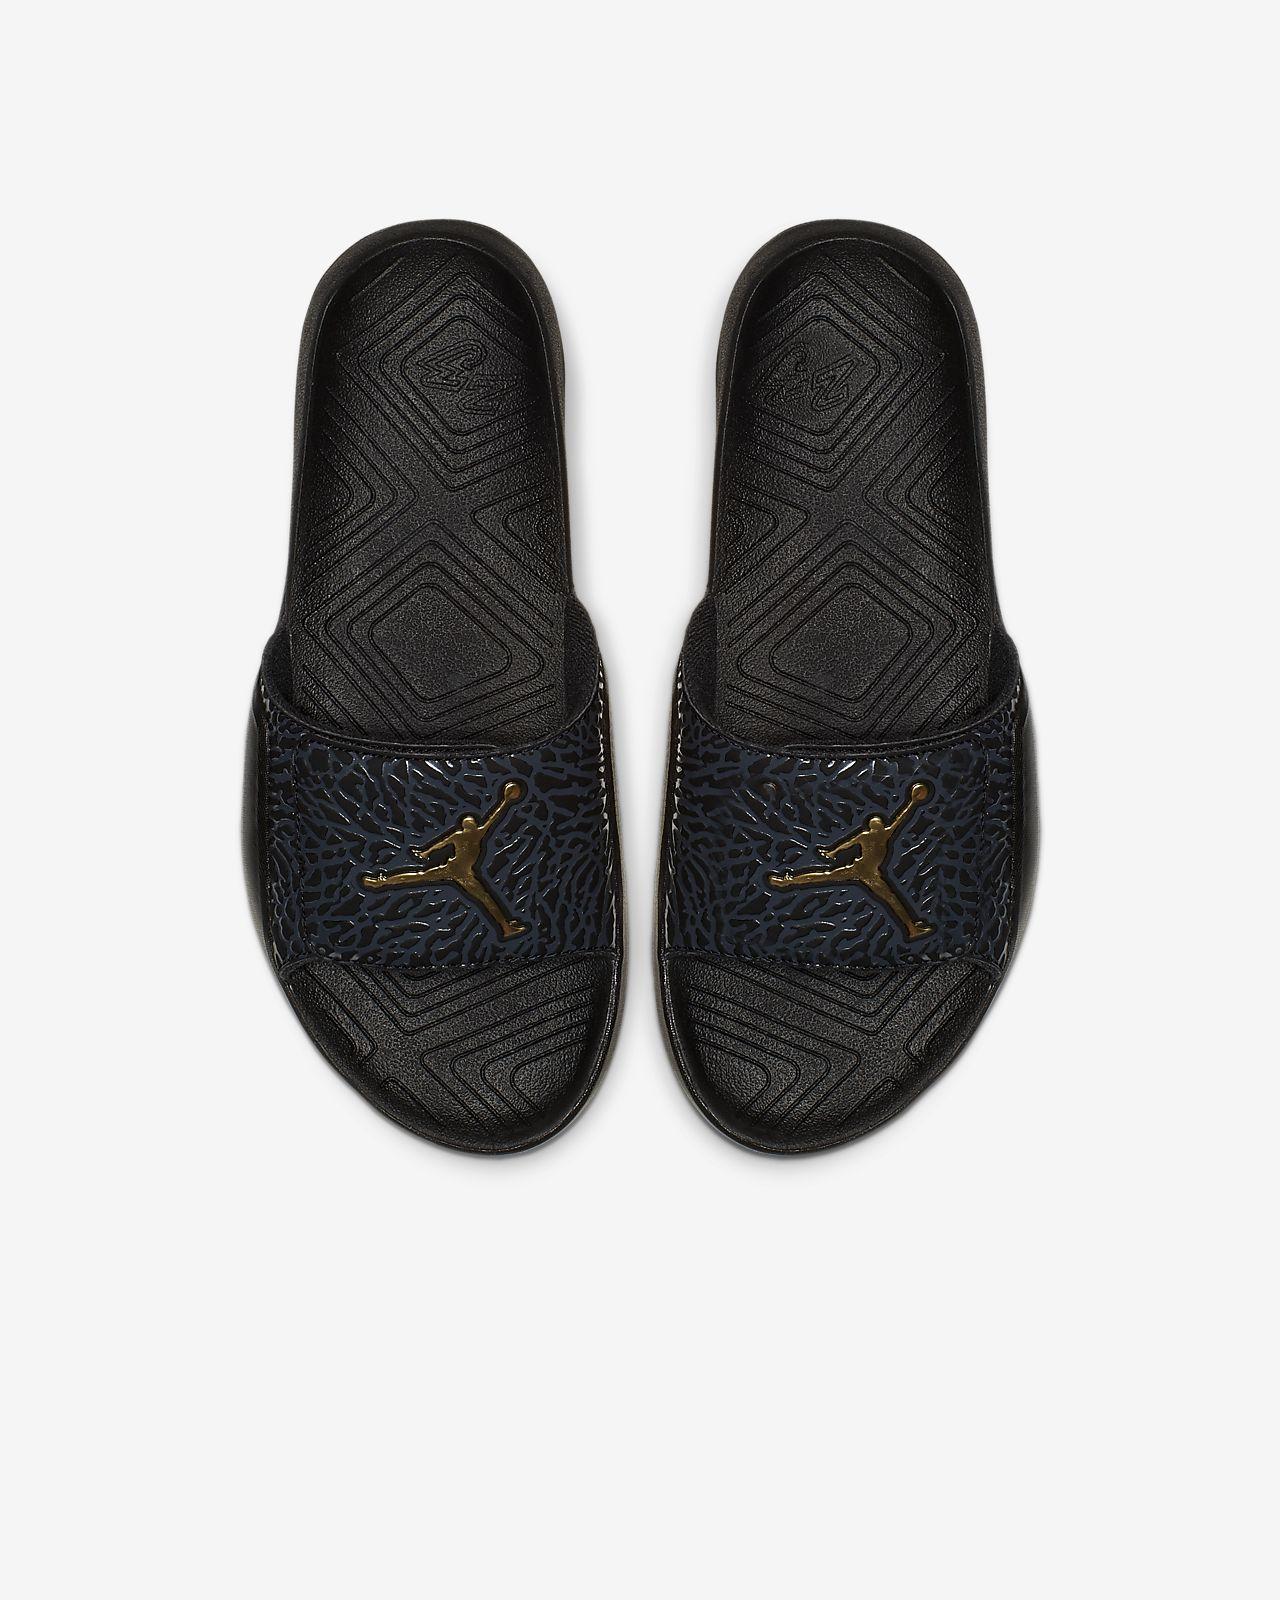 Jordan Hydro 7 V2 拖鞋